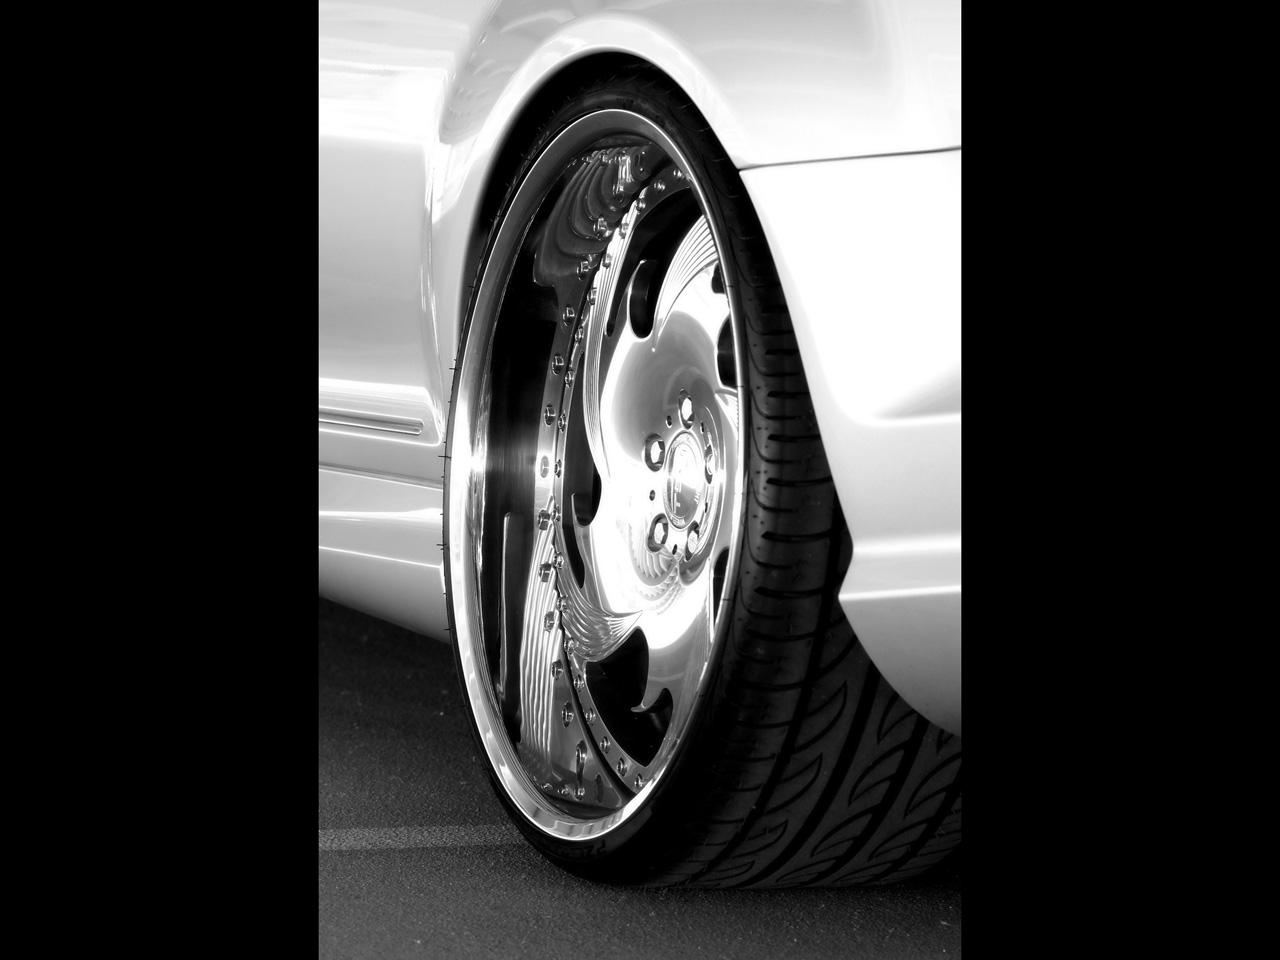 http://4.bp.blogspot.com/-CJ09WZYT7ww/ThNkfHaqYEI/AAAAAAAAG0k/NJV35TesVLQ/s1600/Mercedes-Benz+CL+45+Wallpapers+5.jpg